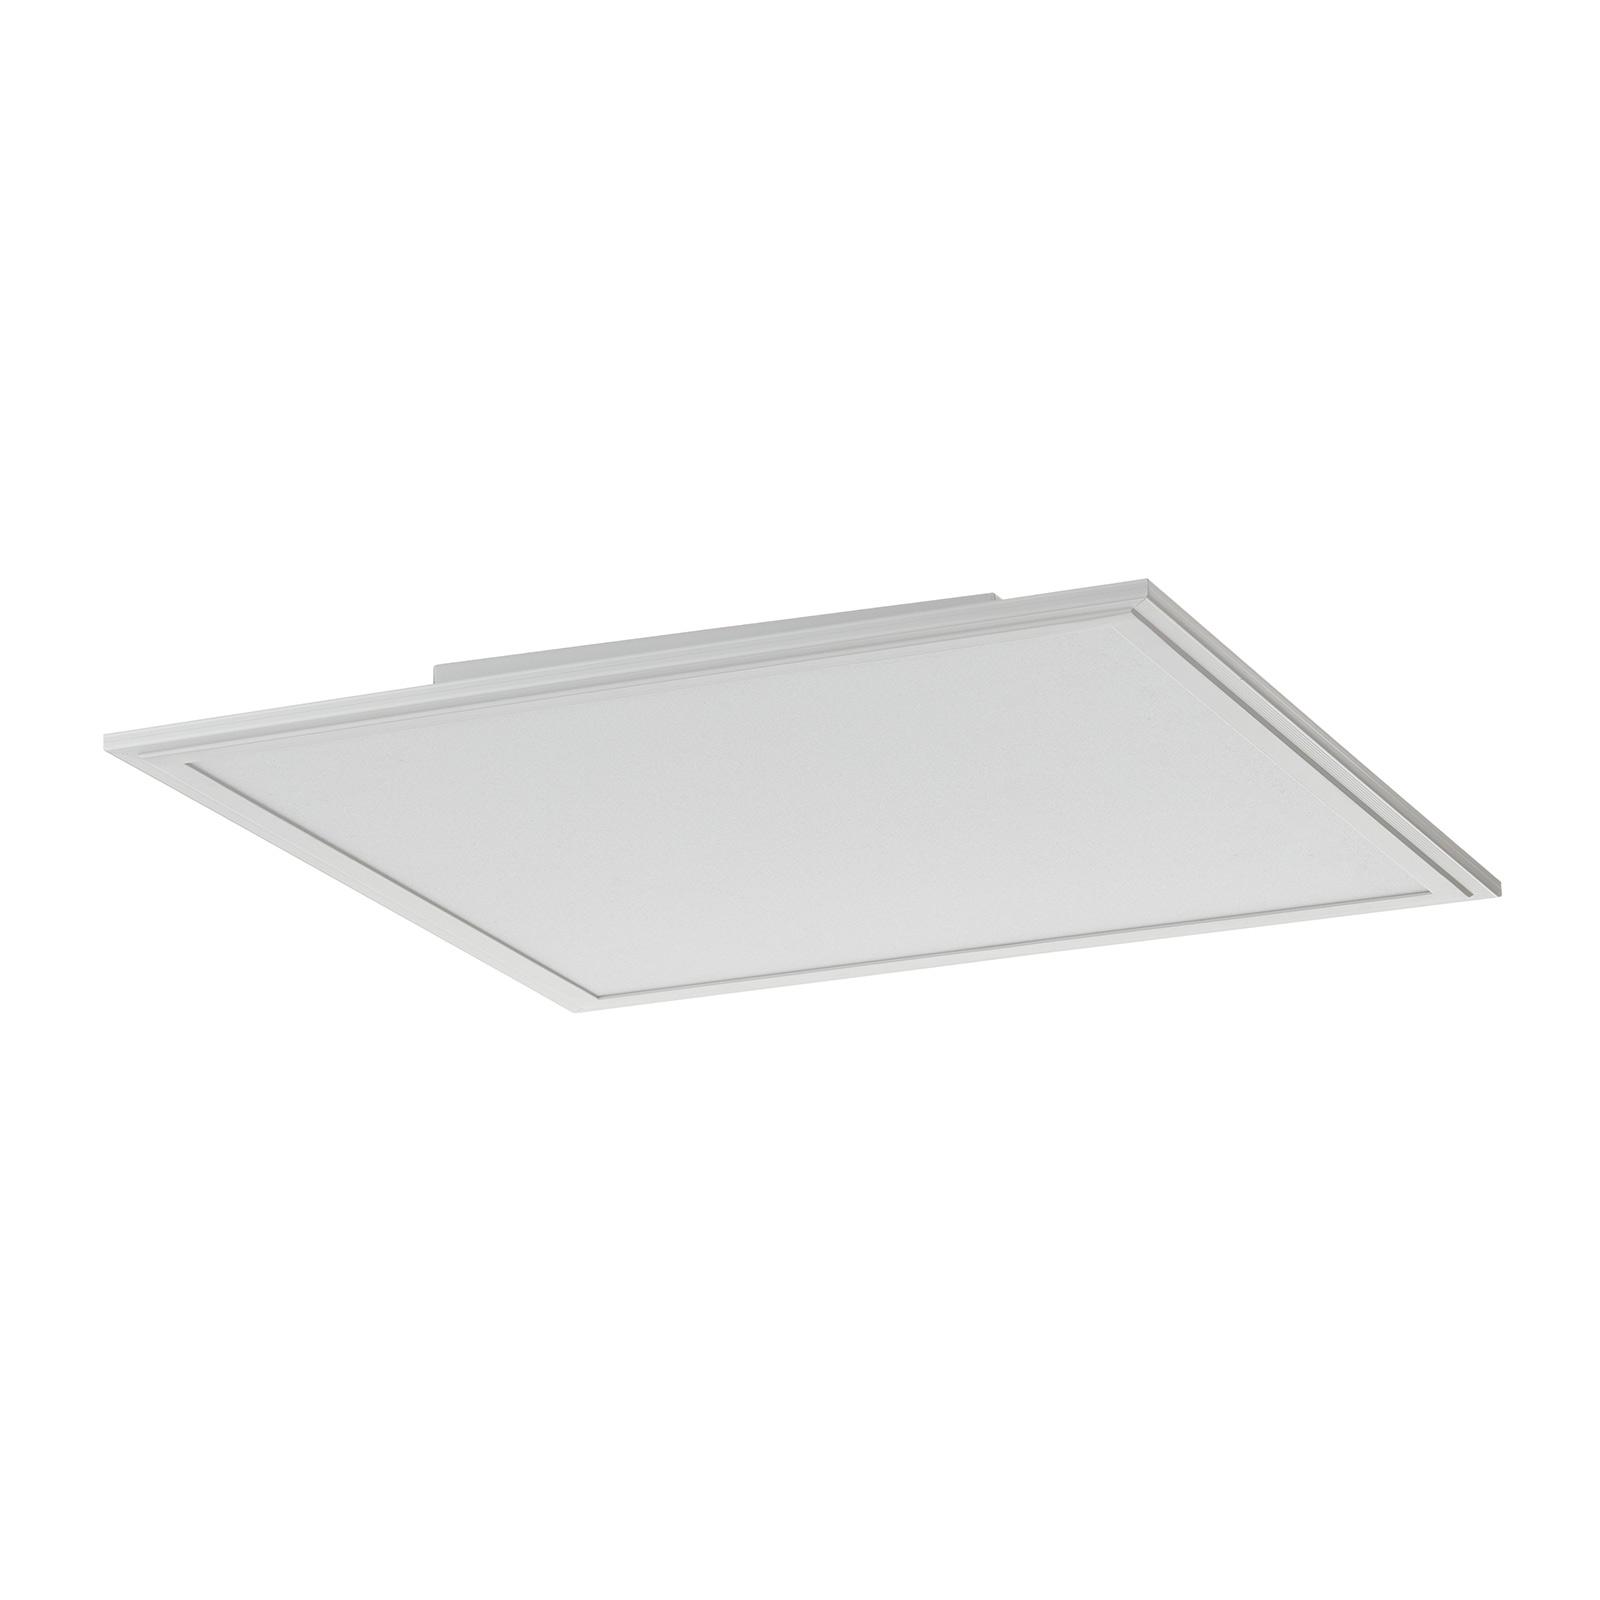 Eglo connect Salobrena-C LED-panel, 45 x 45 cm